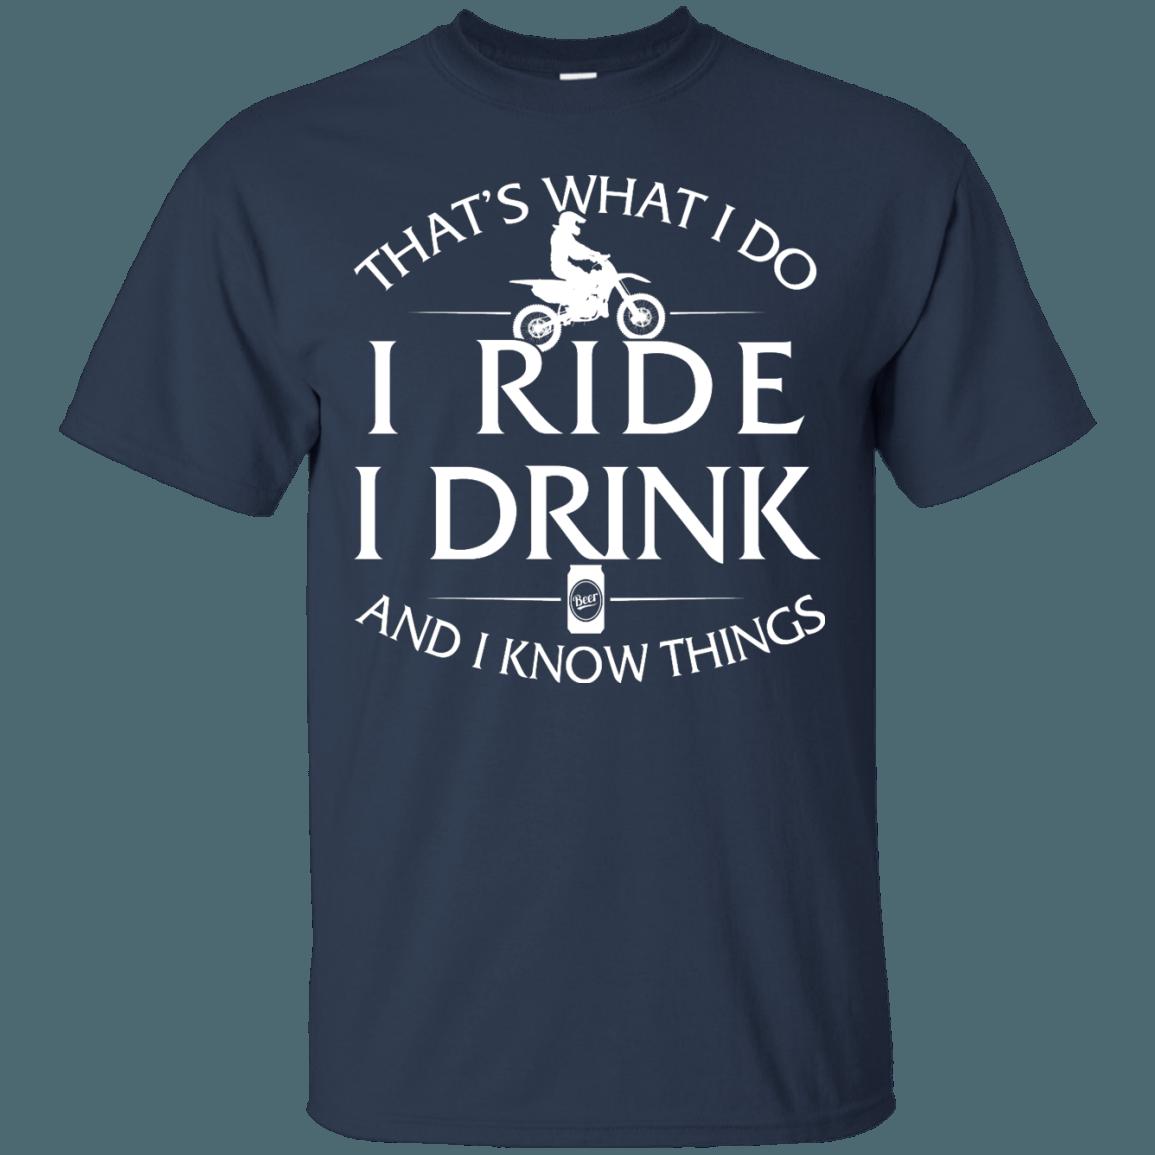 Motocross t shirt: That's What I Do I Ride I Drink